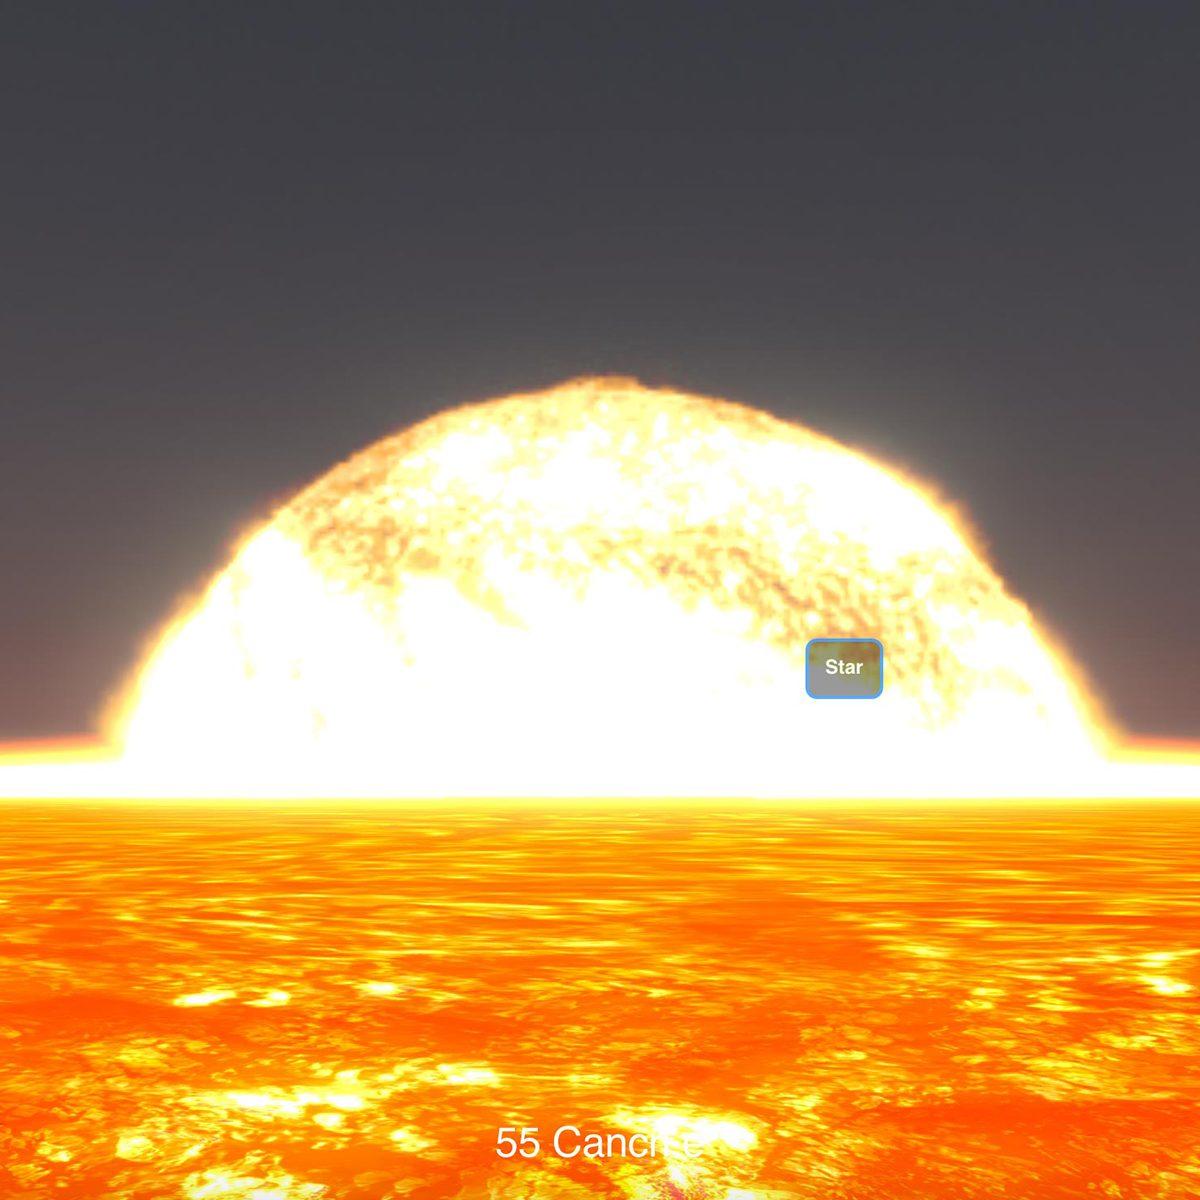 Exoplanet Travel Bureau